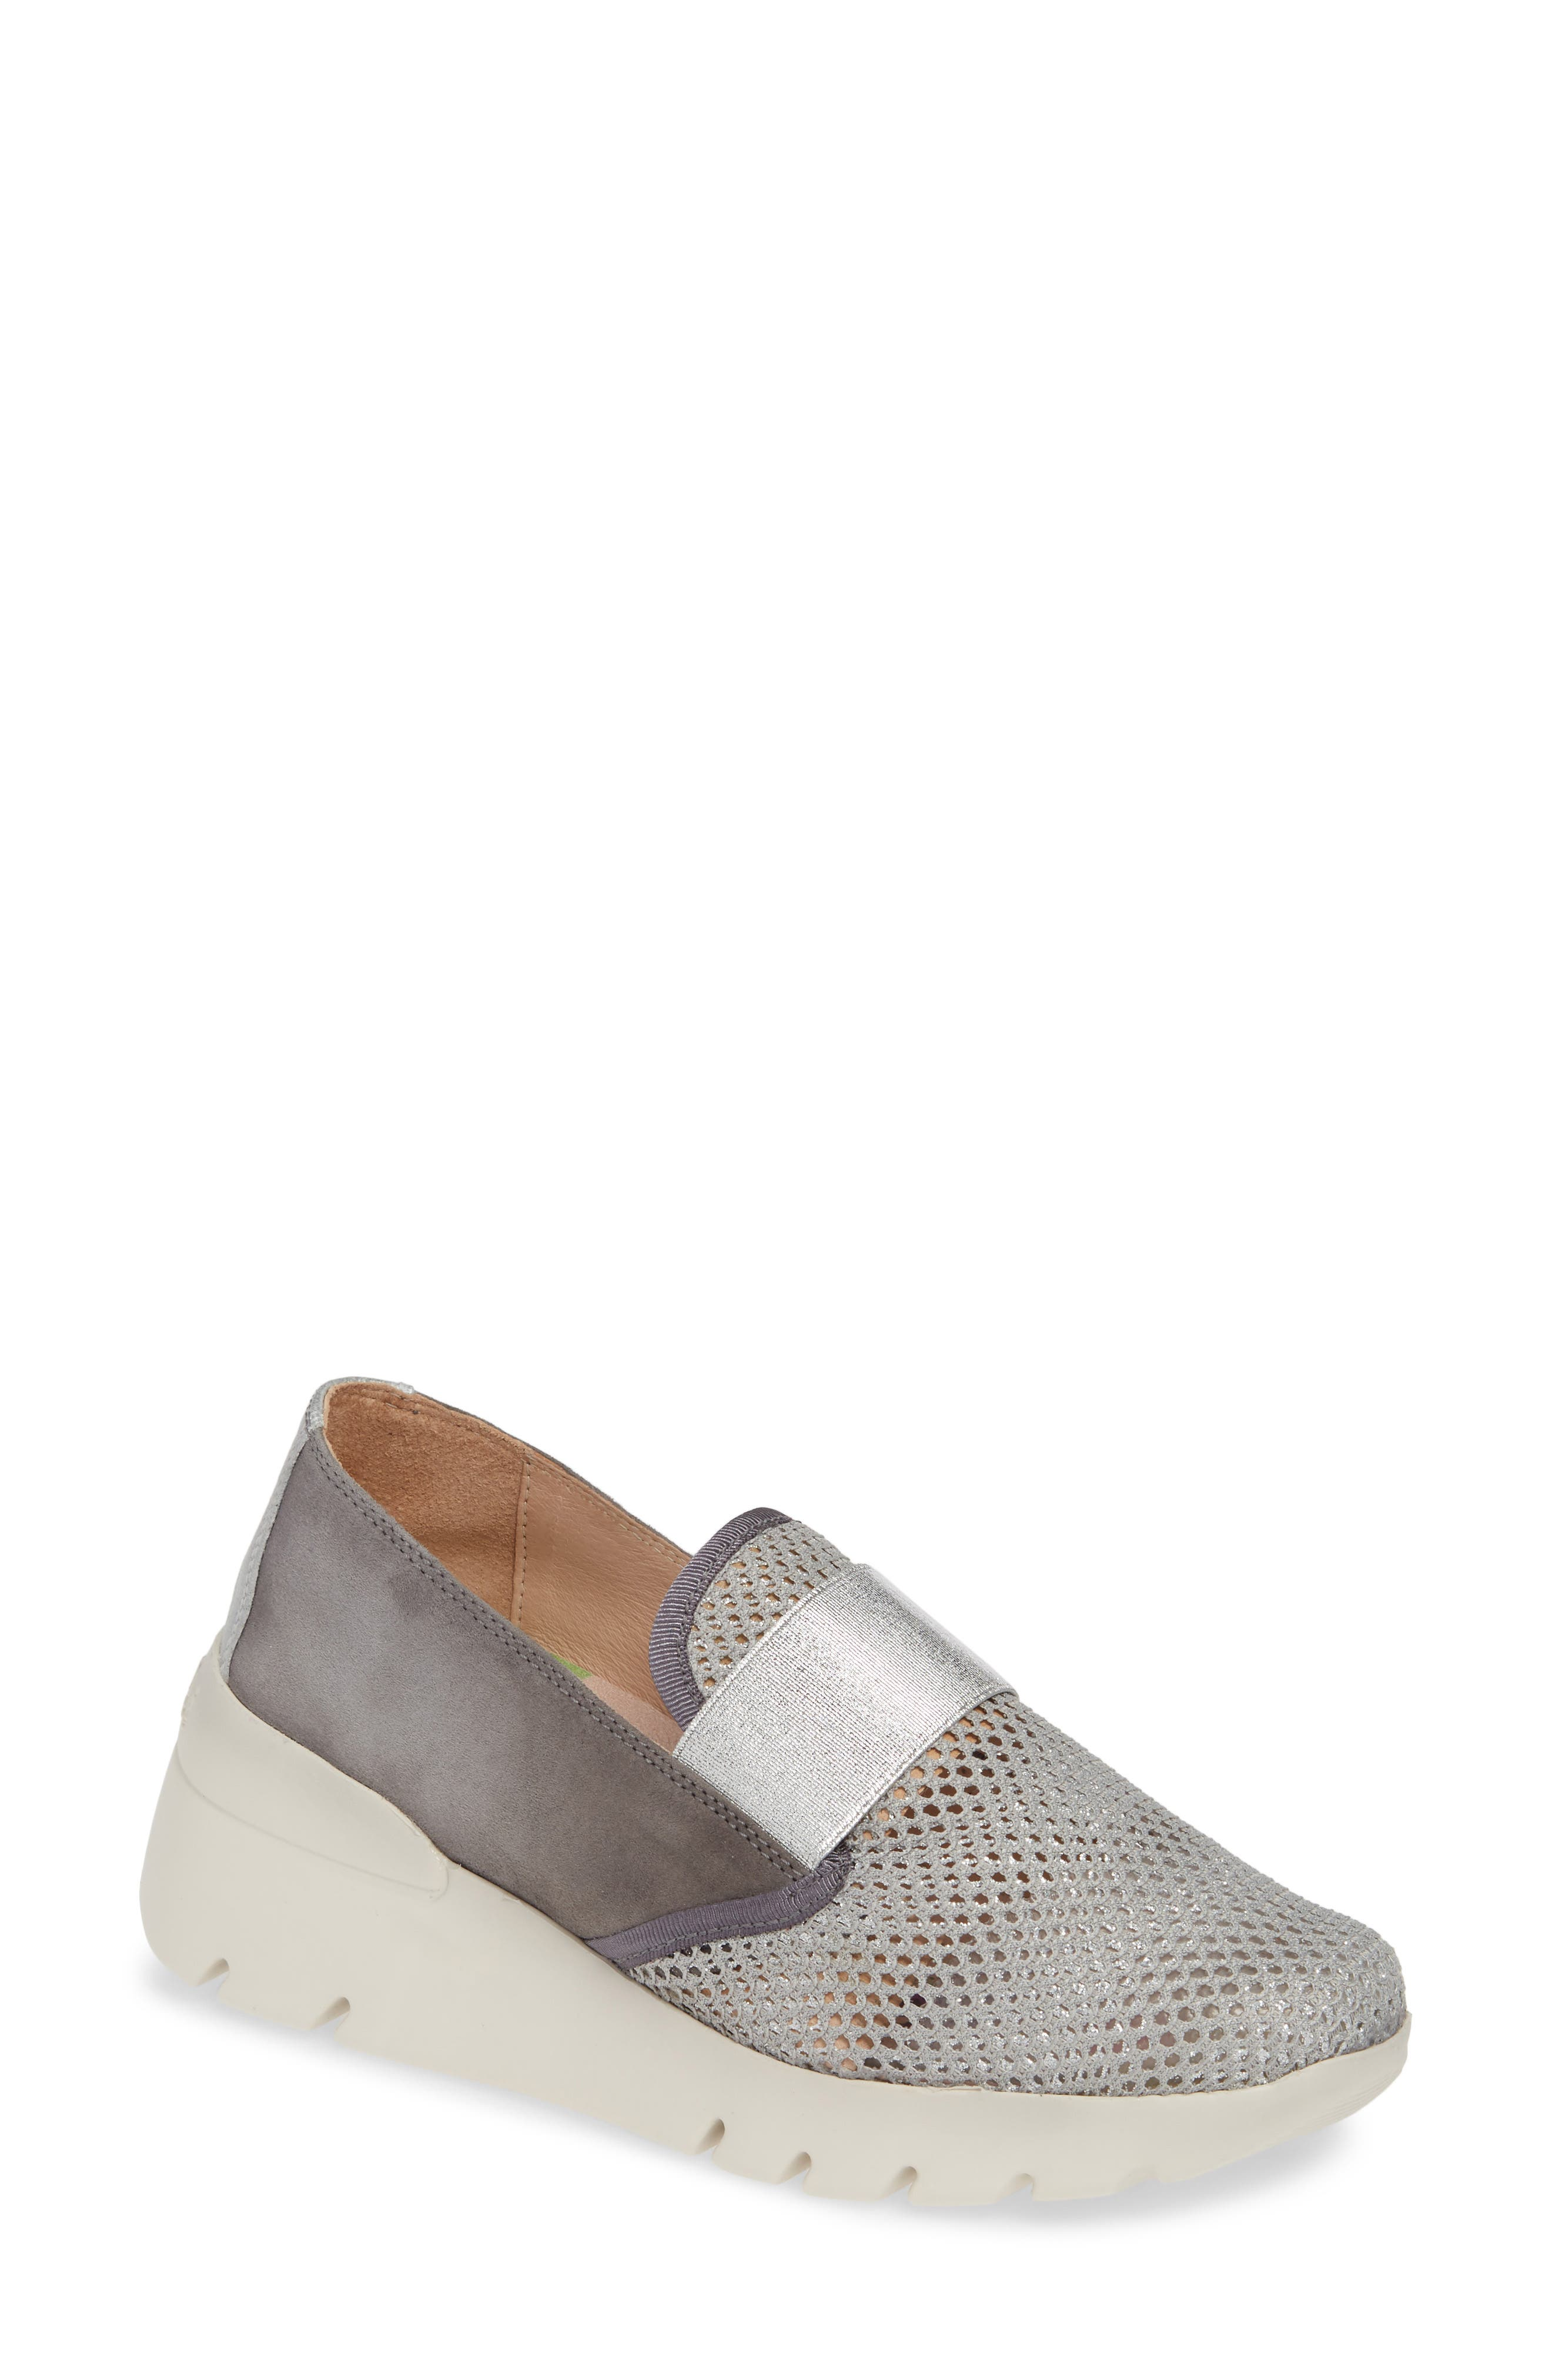 HISPANITAS, Reeva Slip-On Wedge Sneaker, Main thumbnail 1, color, GREY CARBON SUEDE